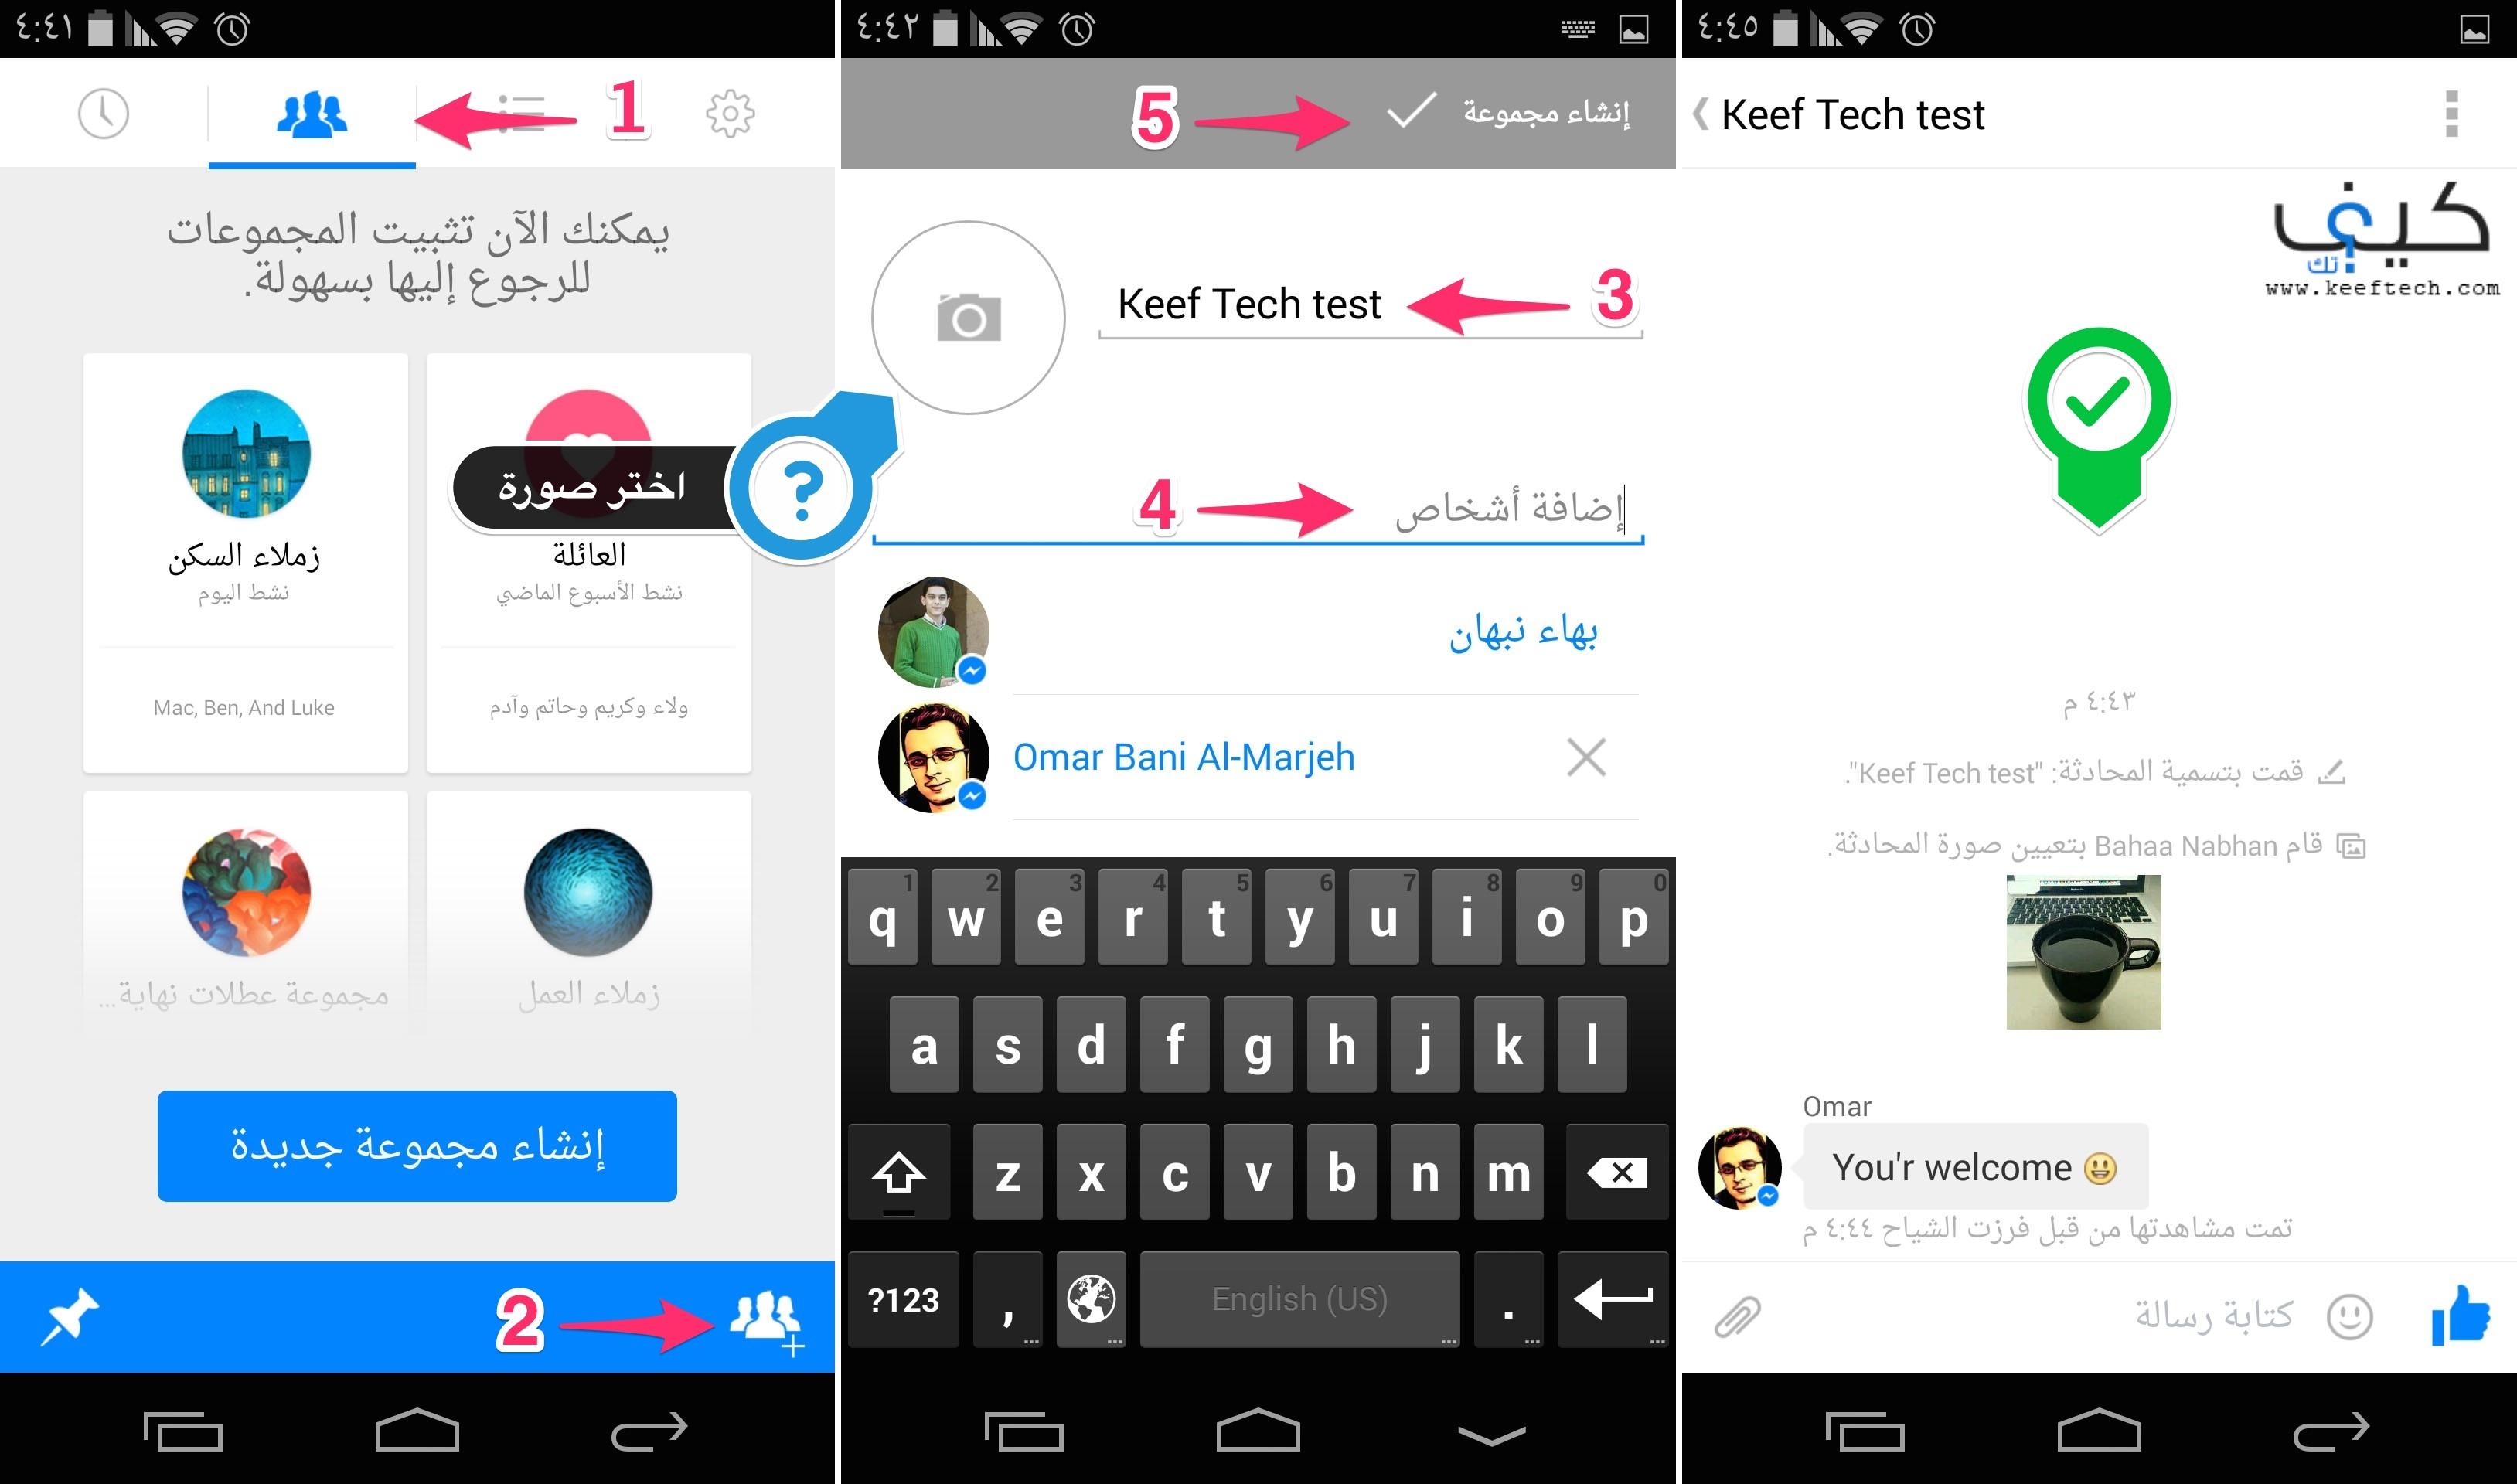 how to create album in facebook using android